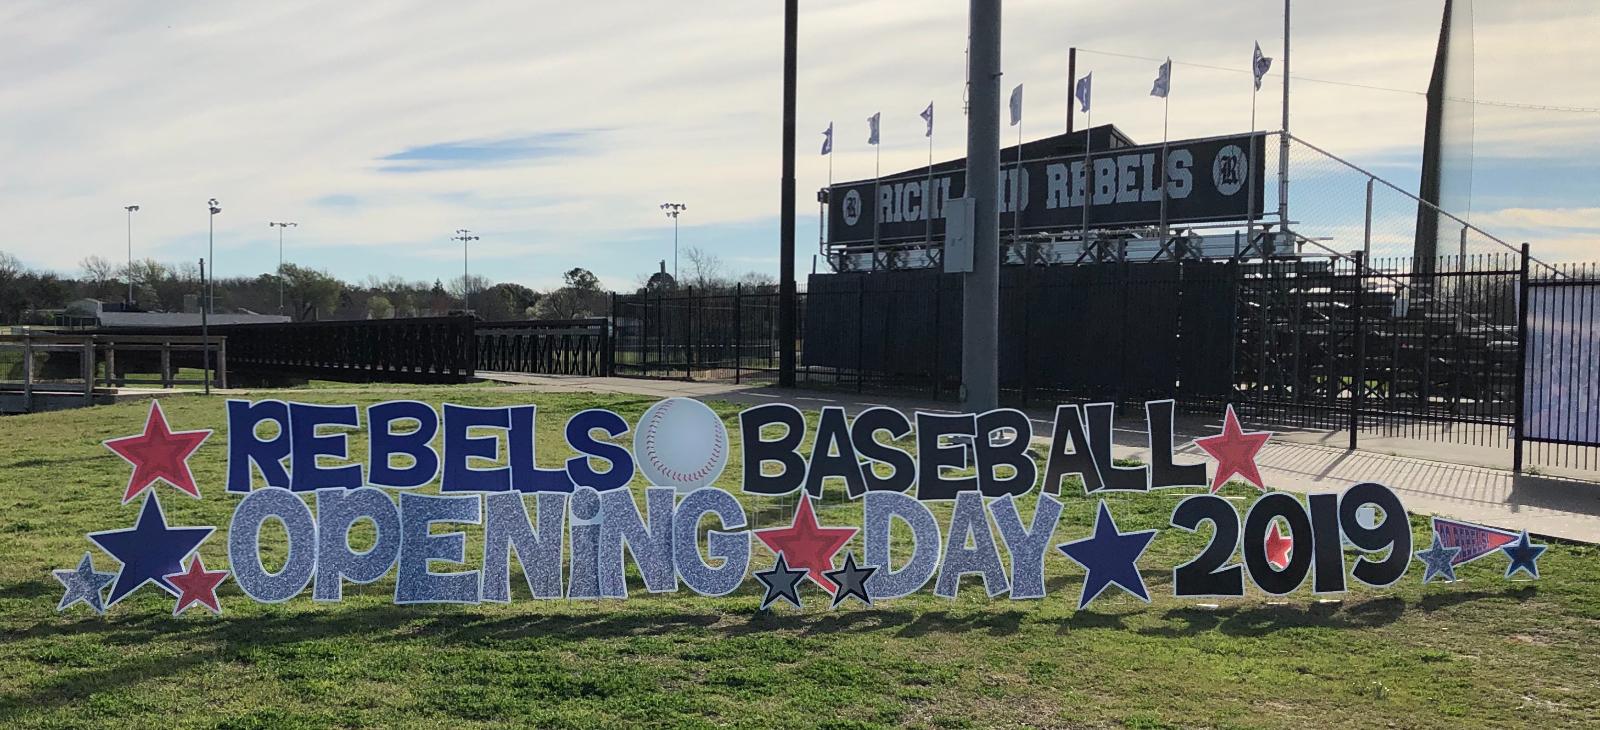 Rebel Baseball racks up the wins today!